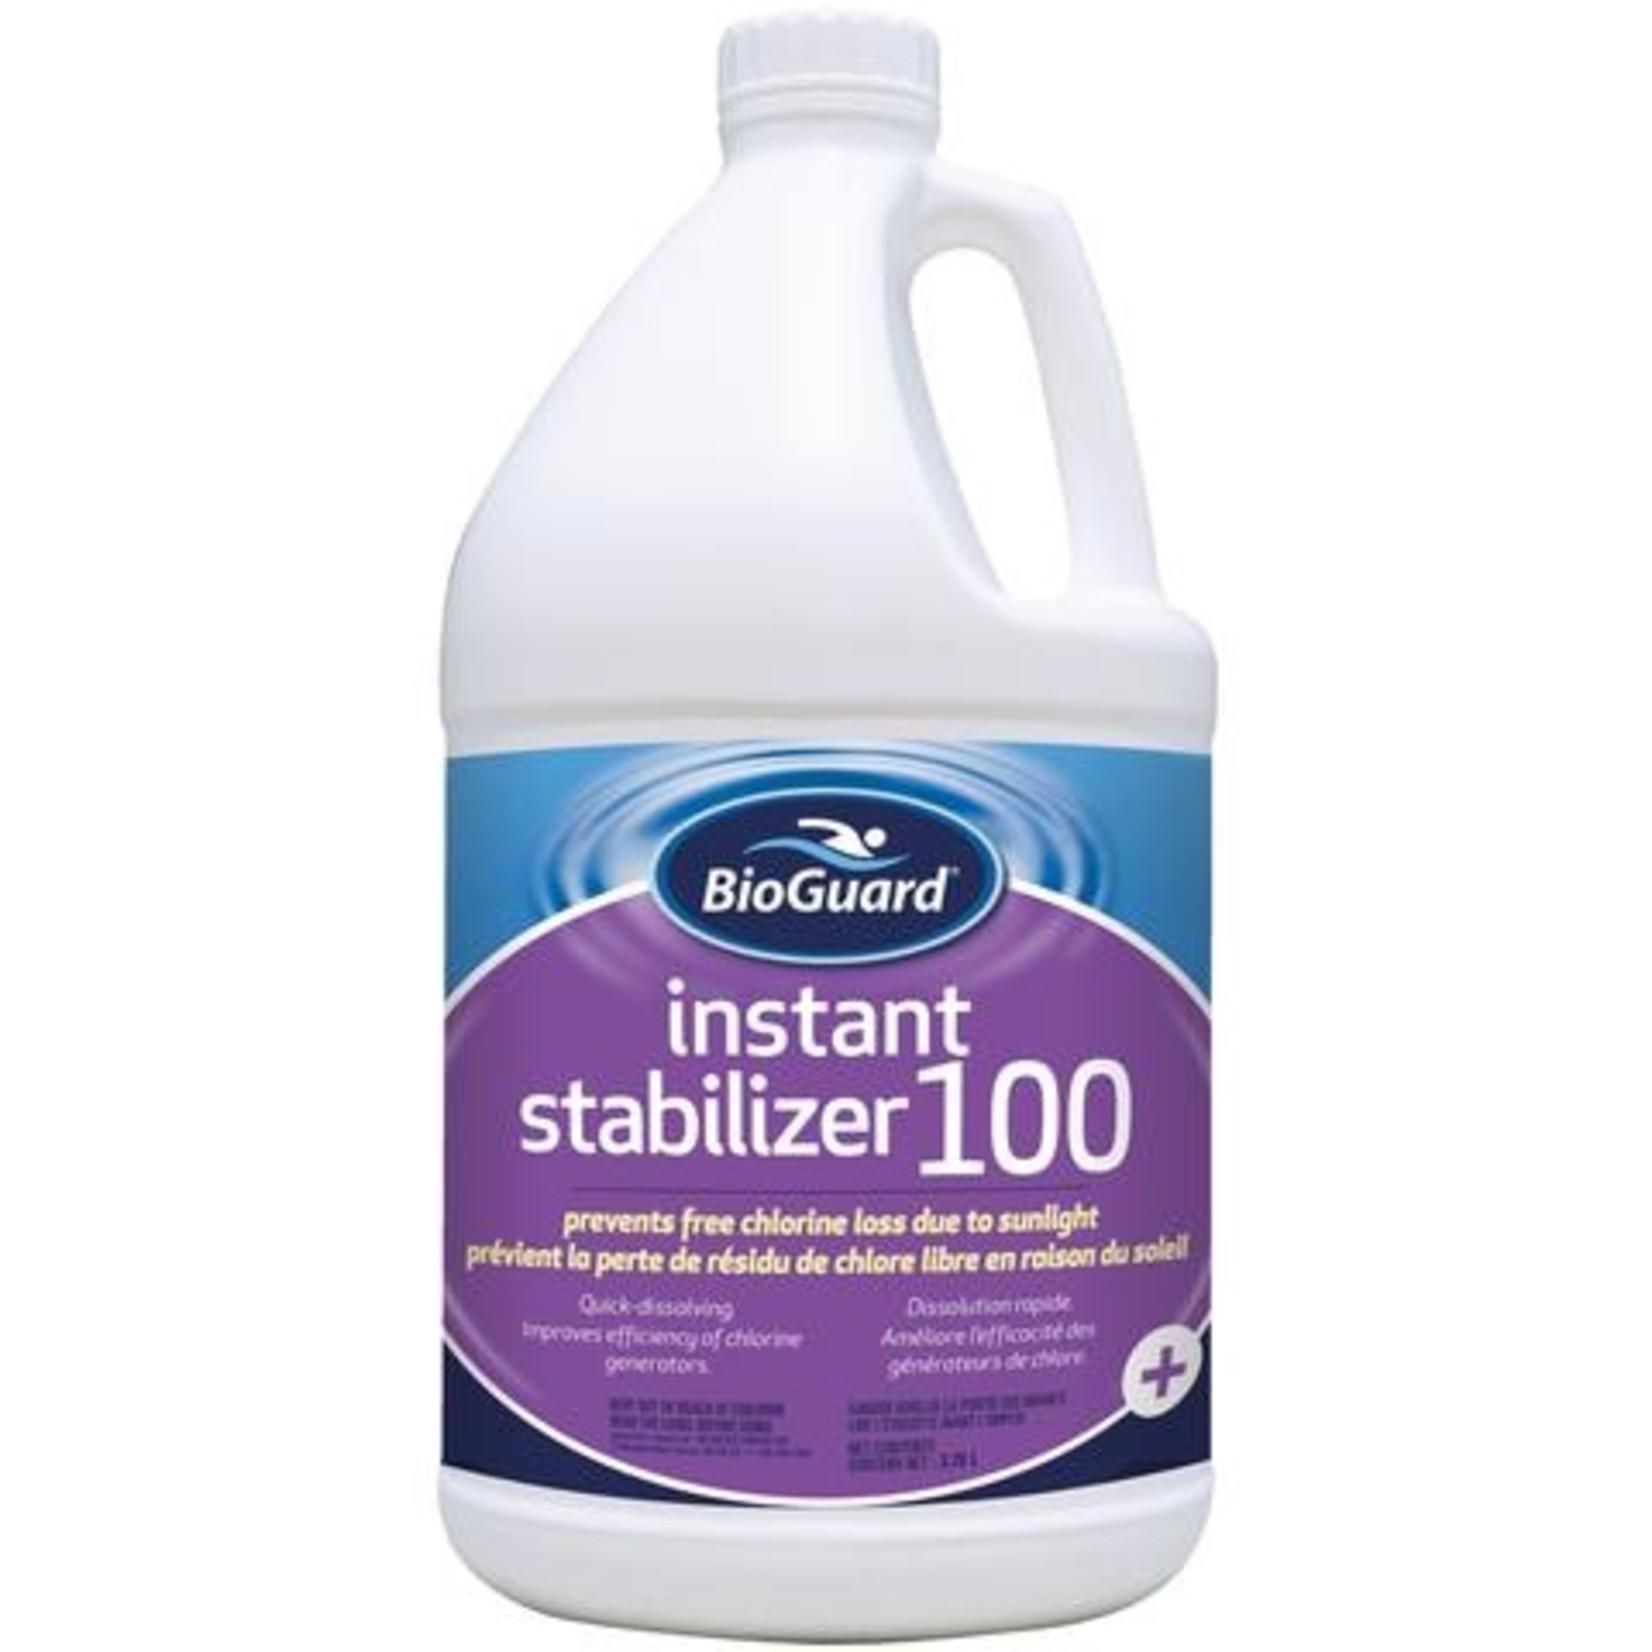 BioGuard Instant Stabilizer 100™ (3.78 L)